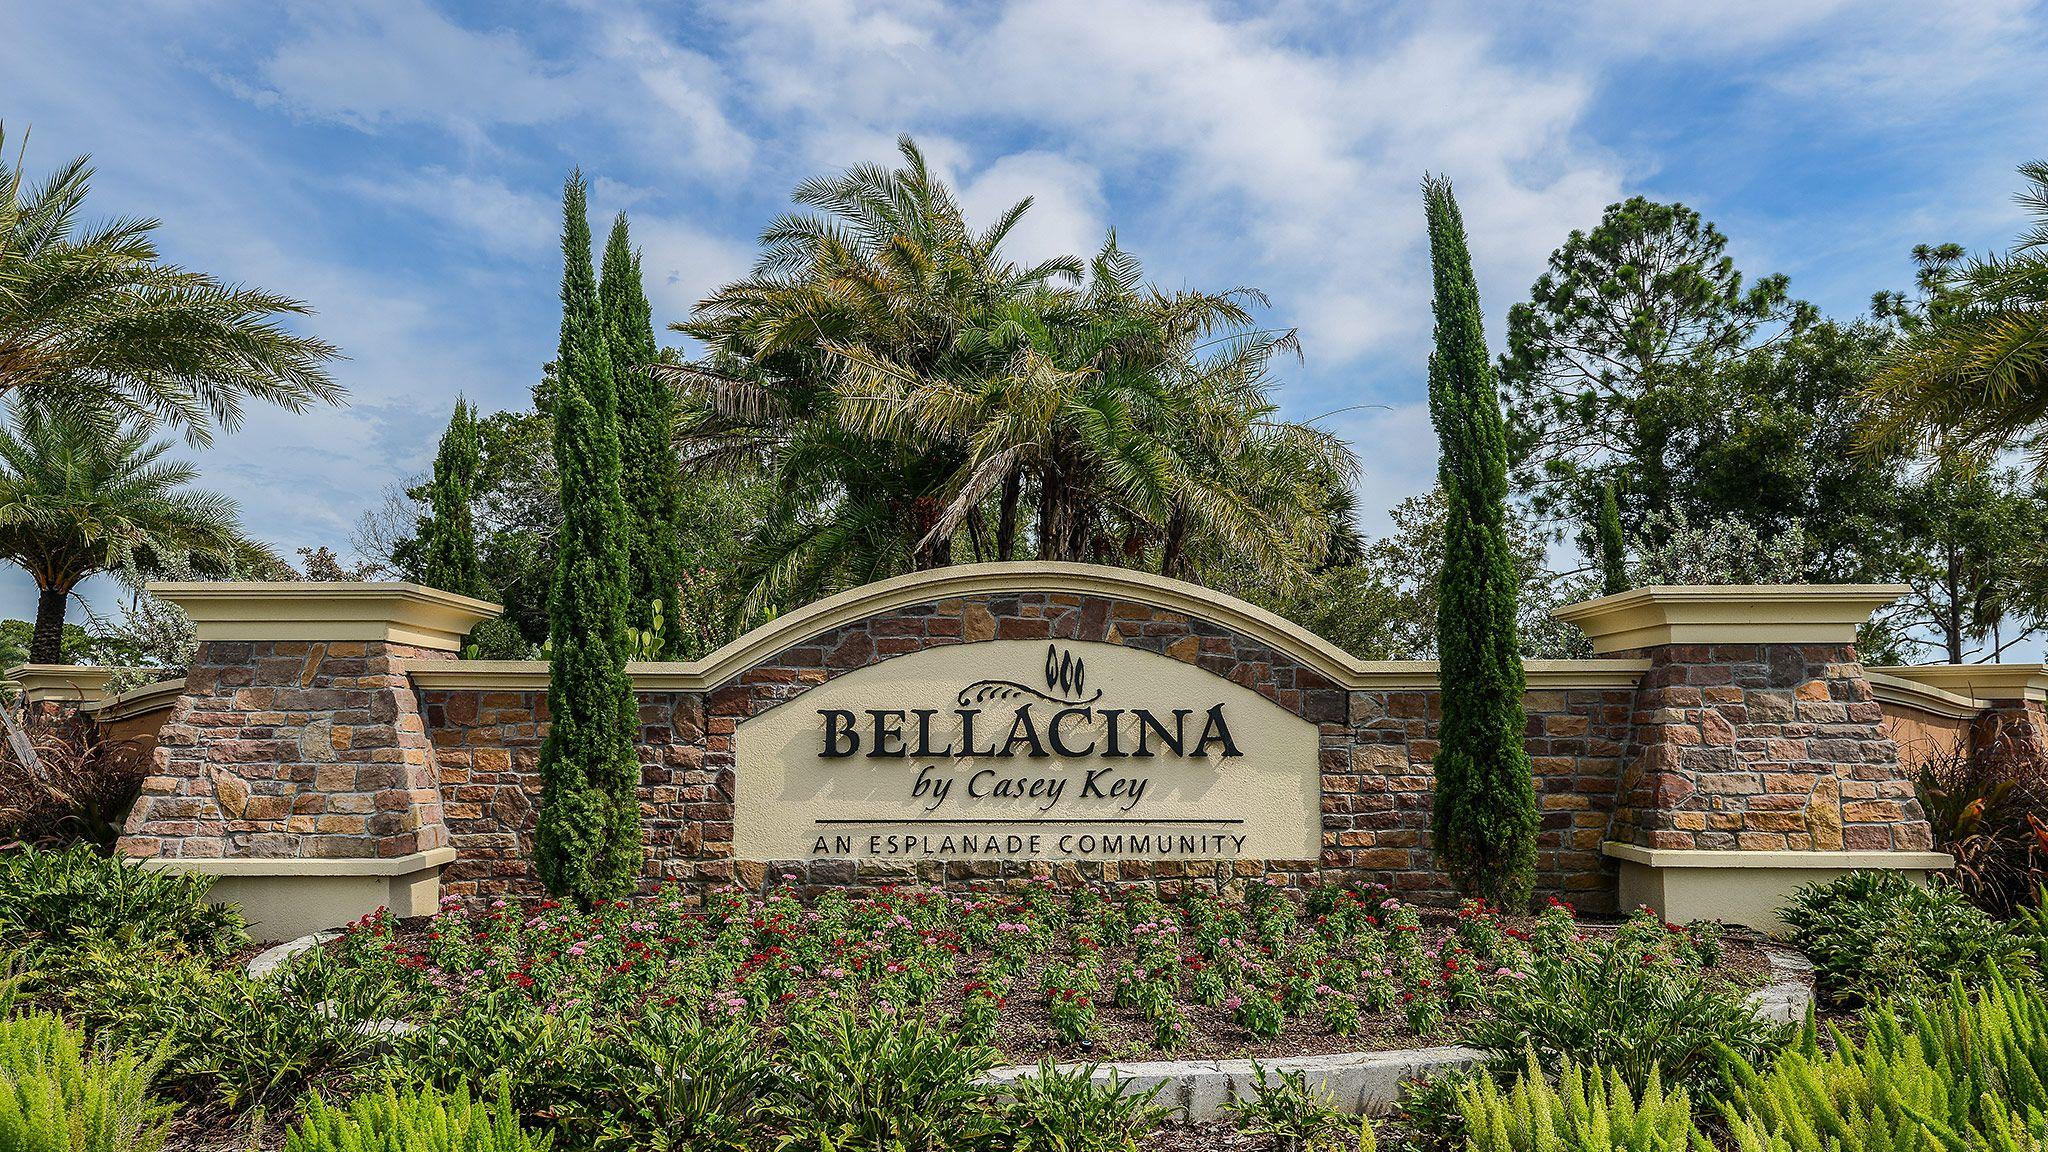 'Bellacina by Casey Key' by Taylor Morrison - Sarasota in Sarasota-Bradenton